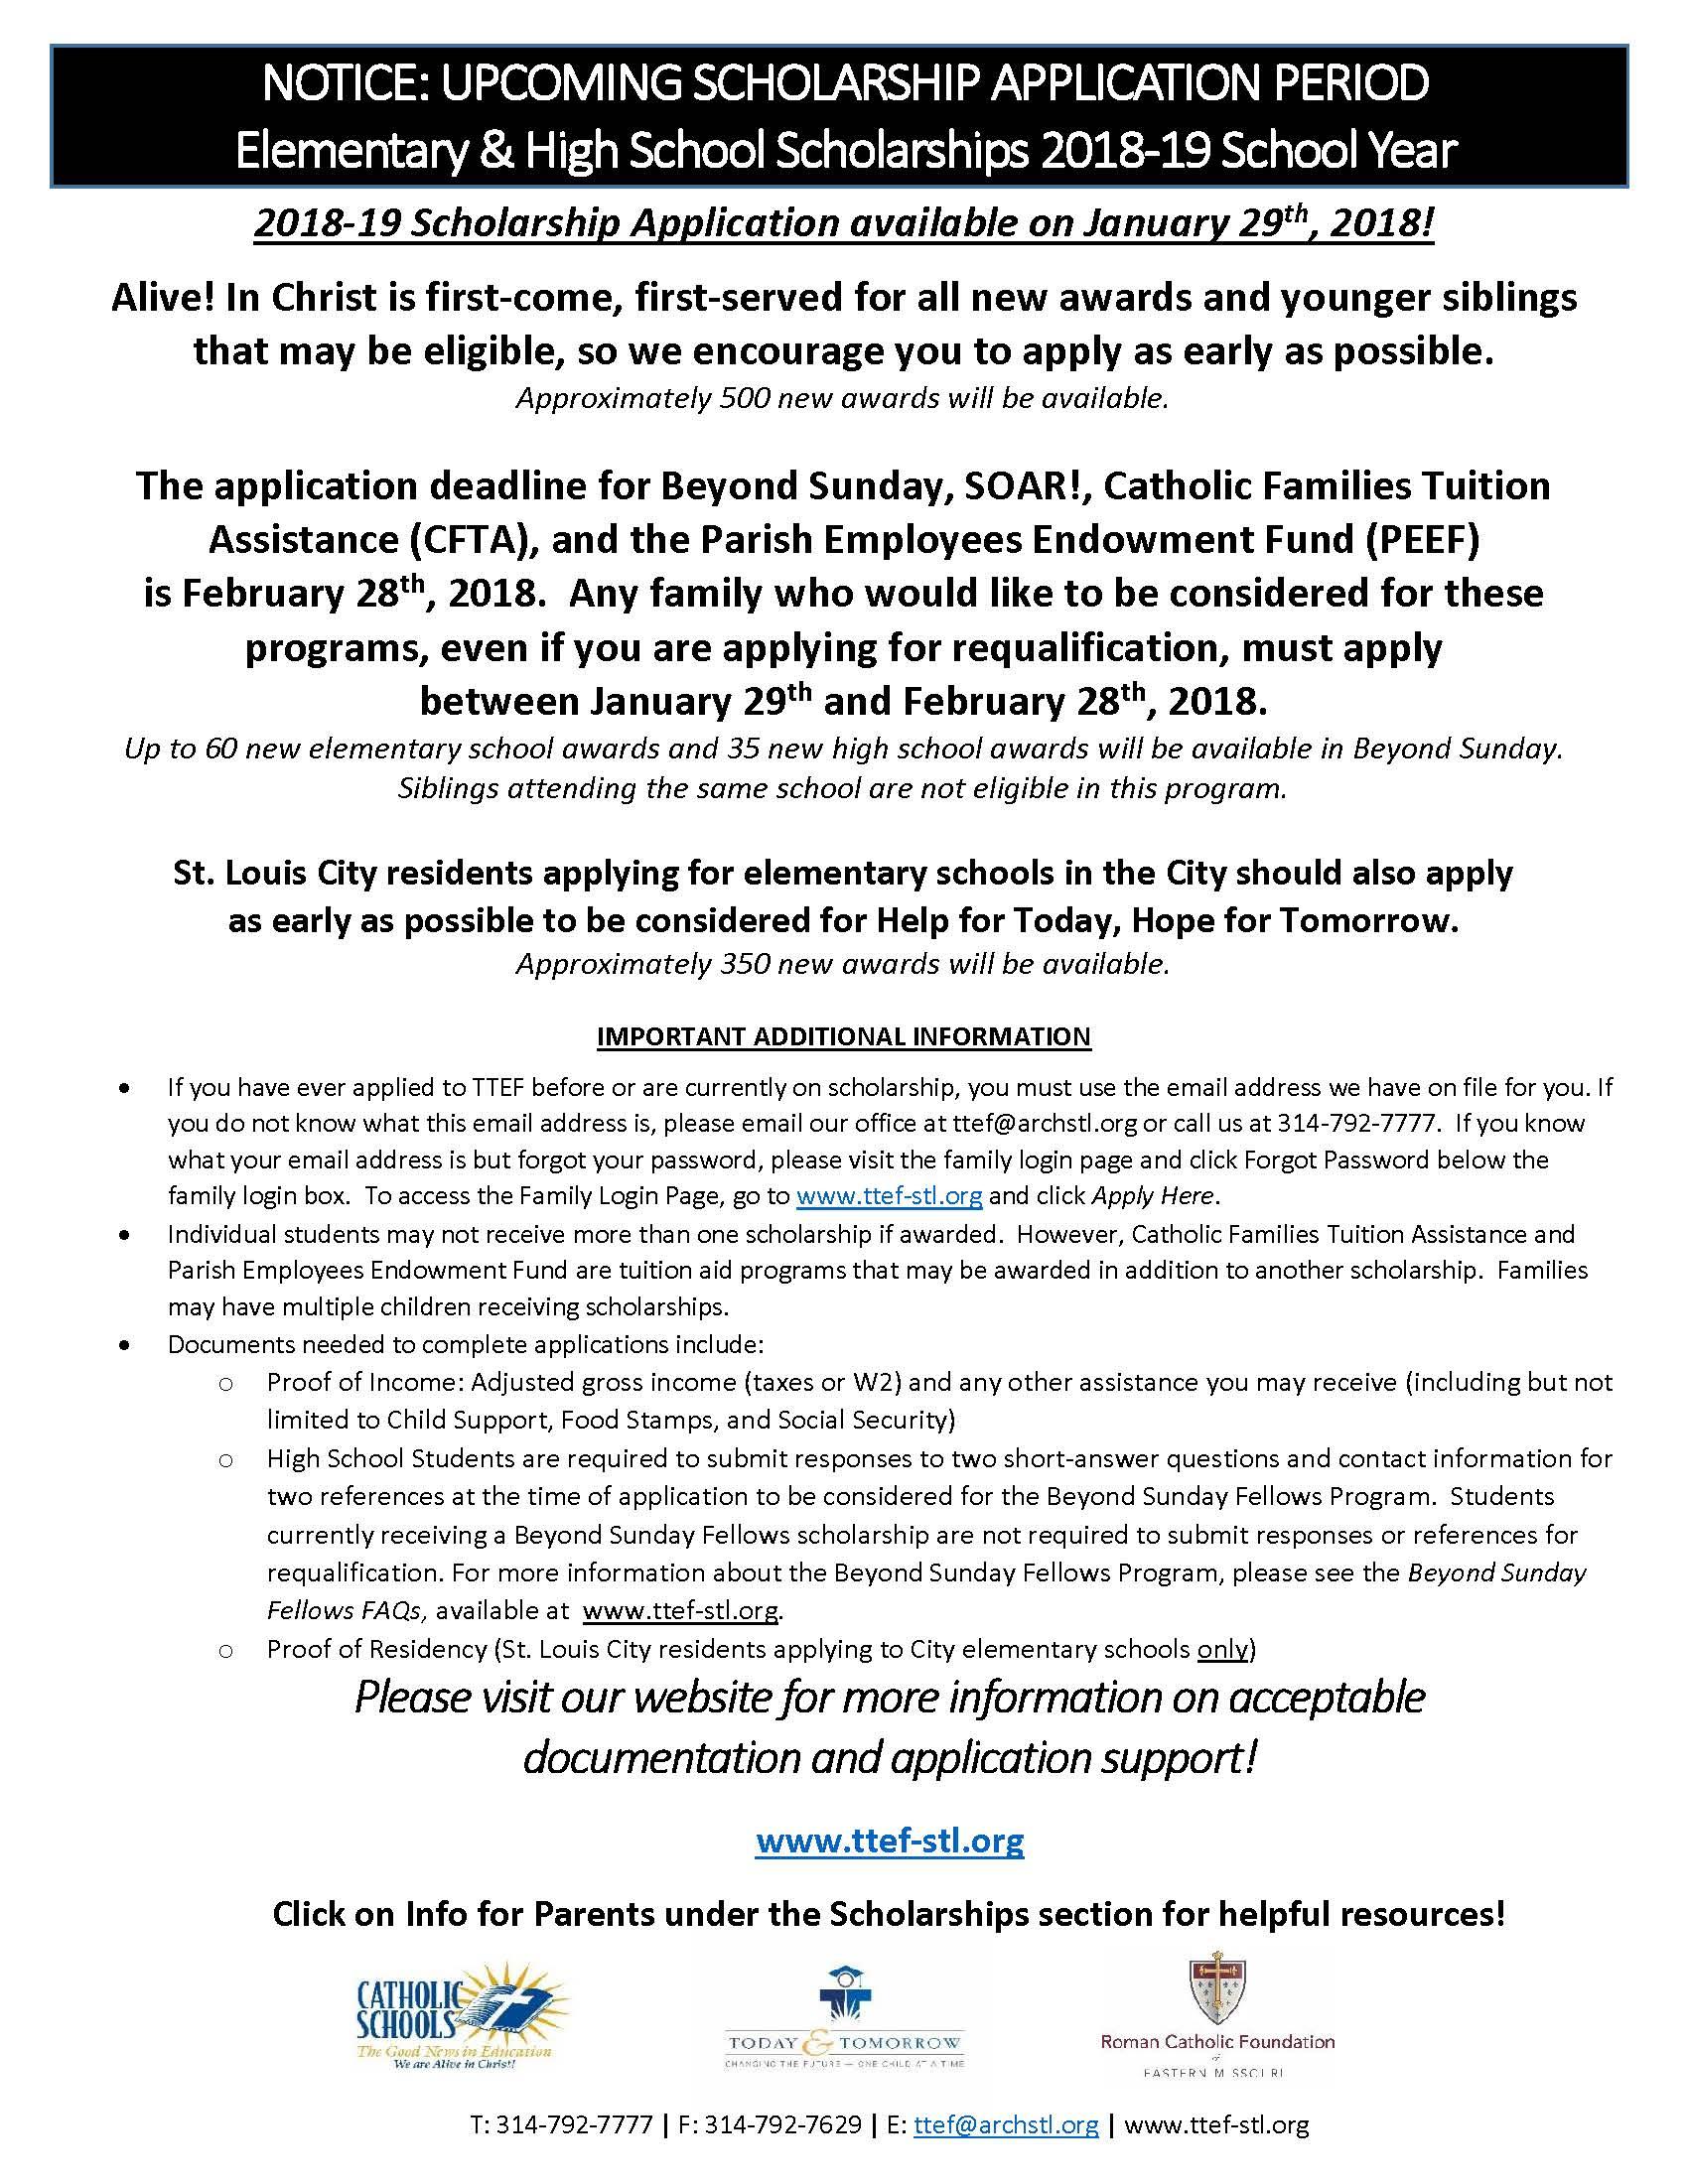 Bulletin Notice 2018-19 Scholarships (1).jpg